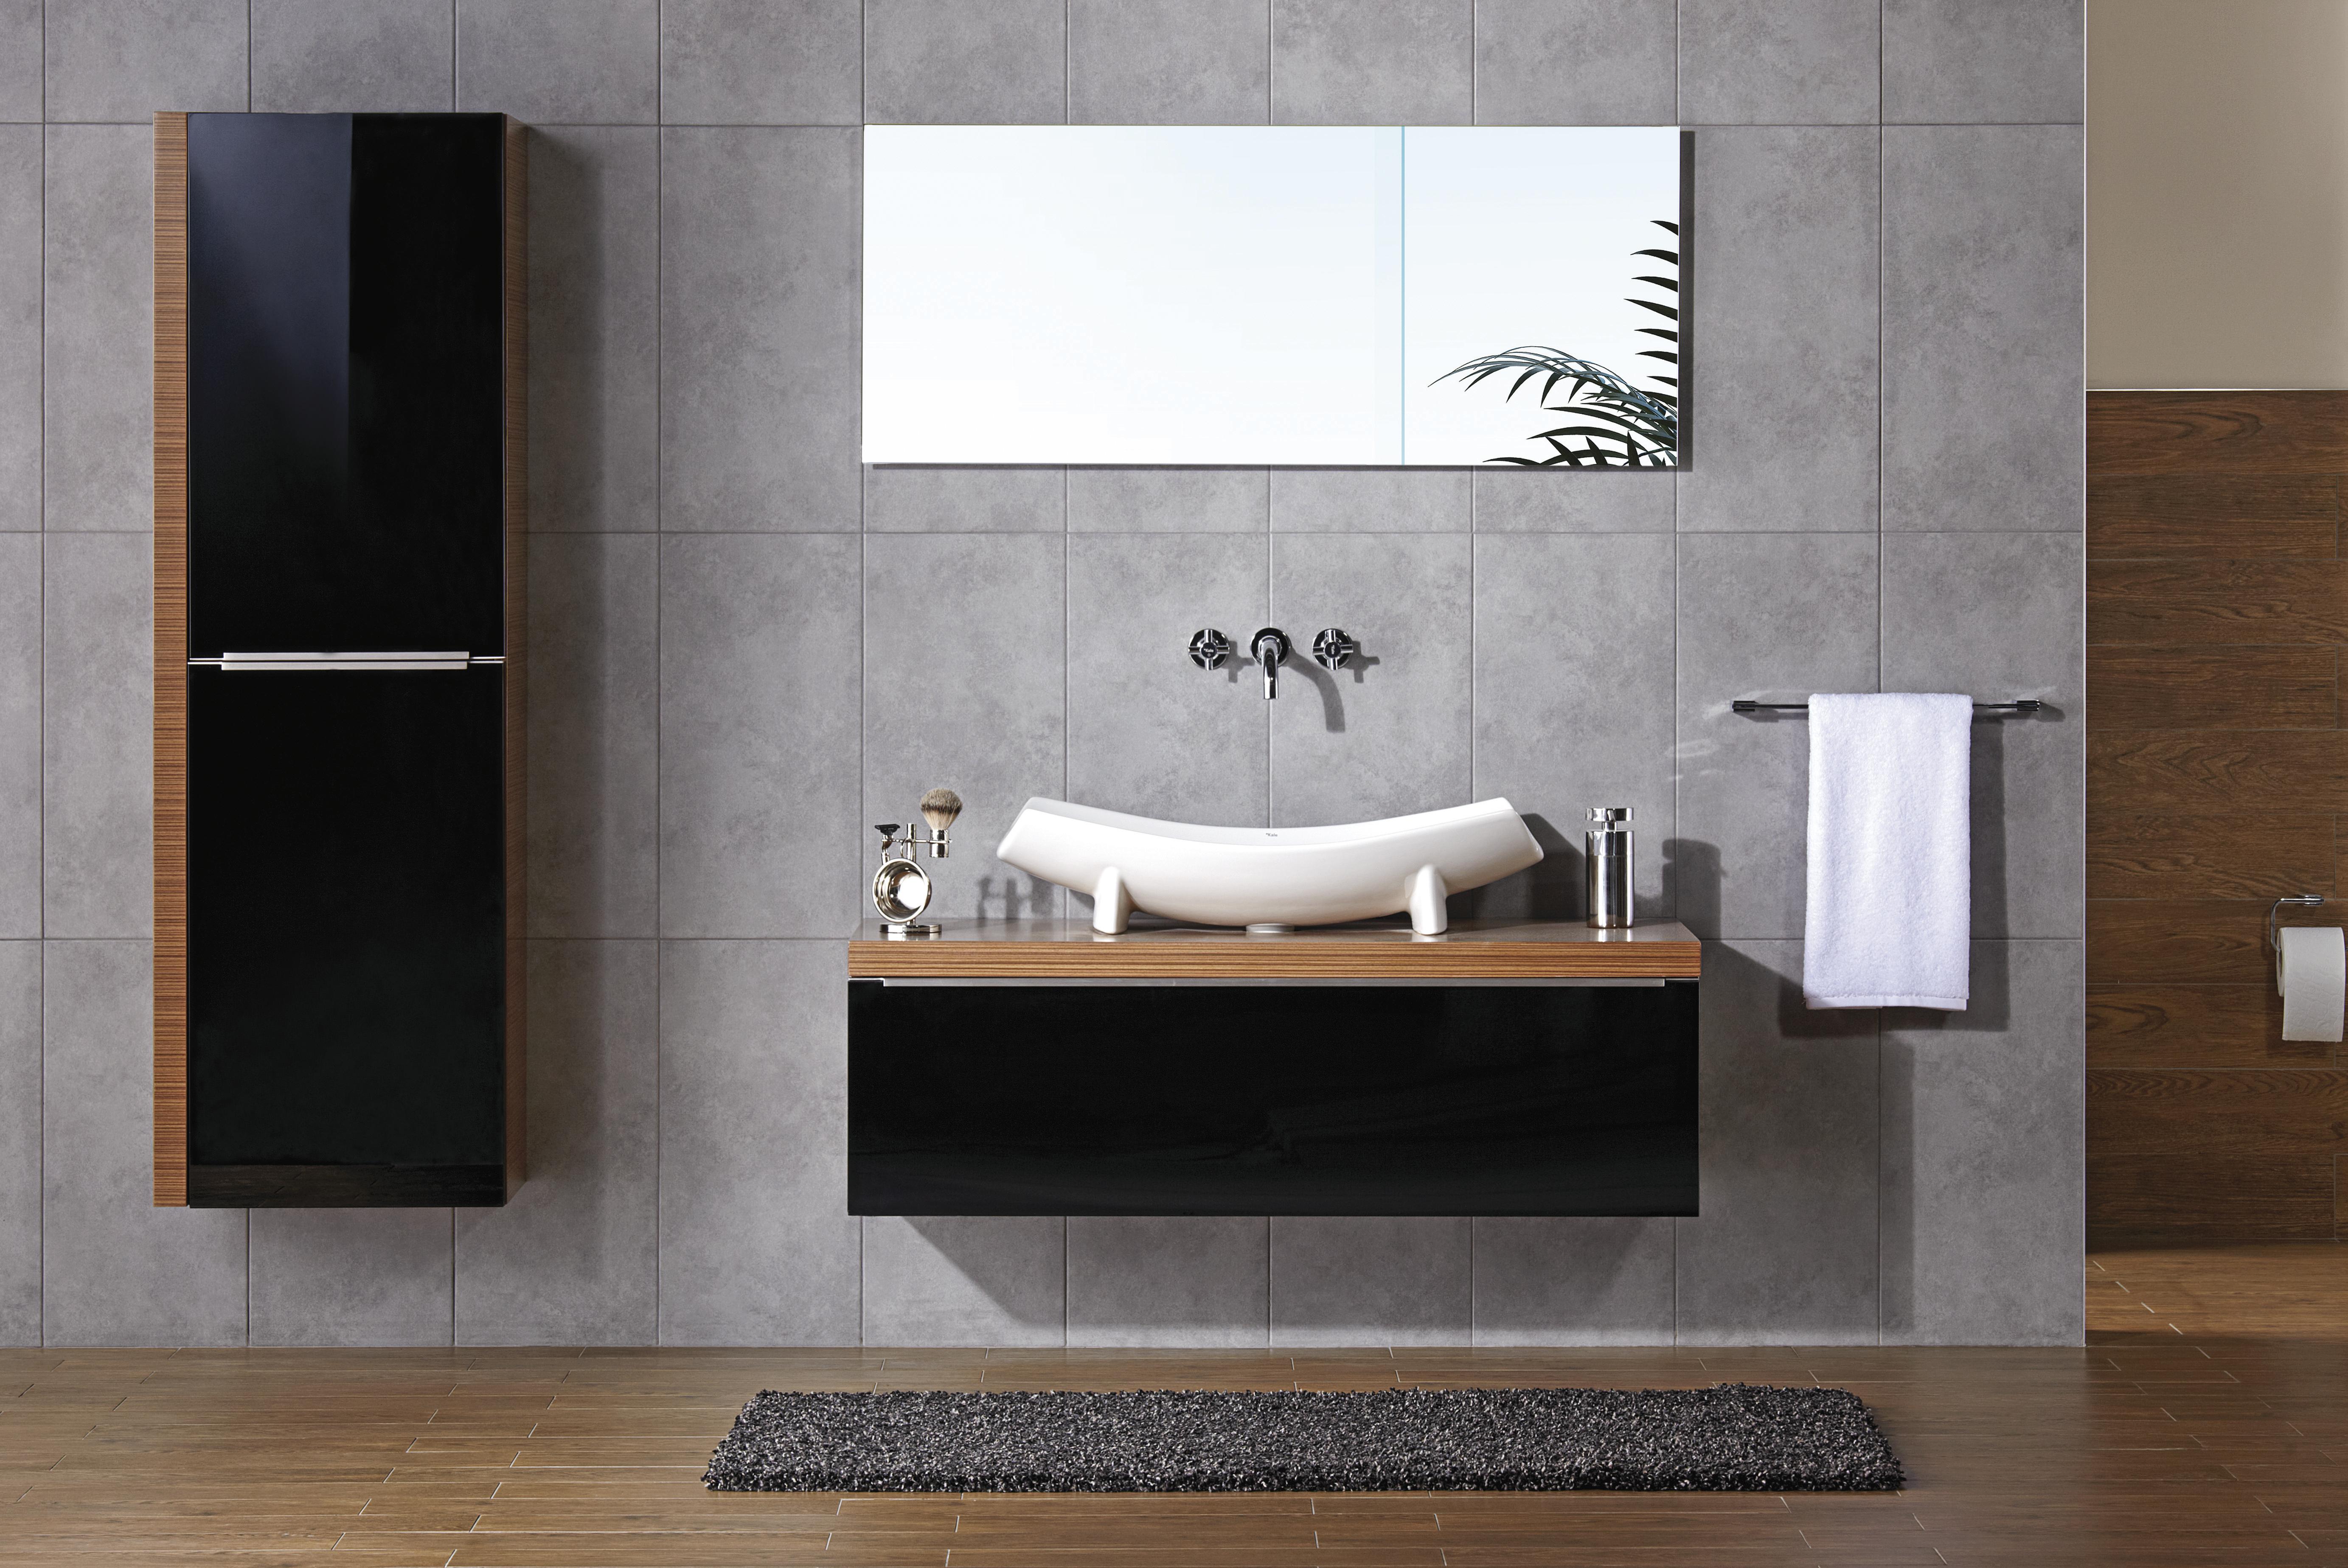 Badmöbel komplettset  Badmöbel - Badezimmer Badmoebel Komplett set - Badshop, Baushop ...